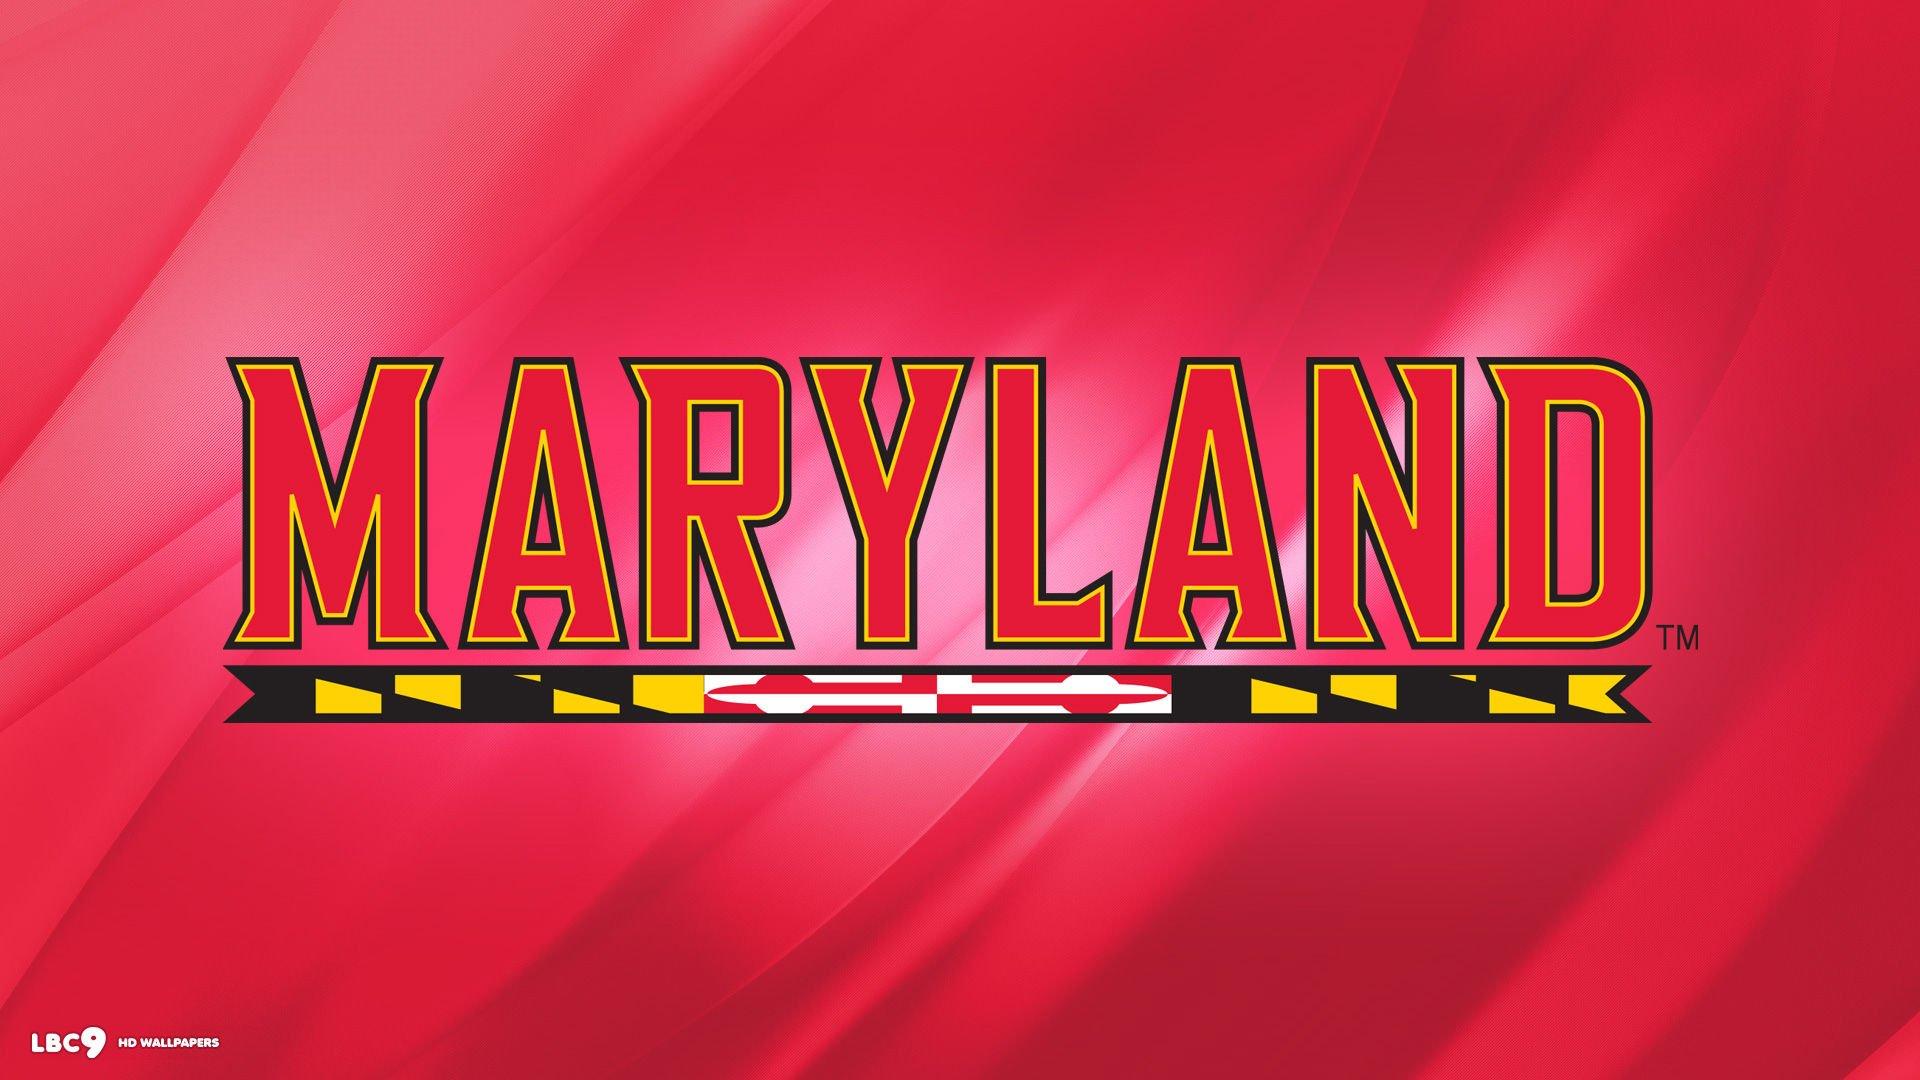 Best 44 University of Maryland Wallpaper on HipWallpaper Pixar 1920x1080